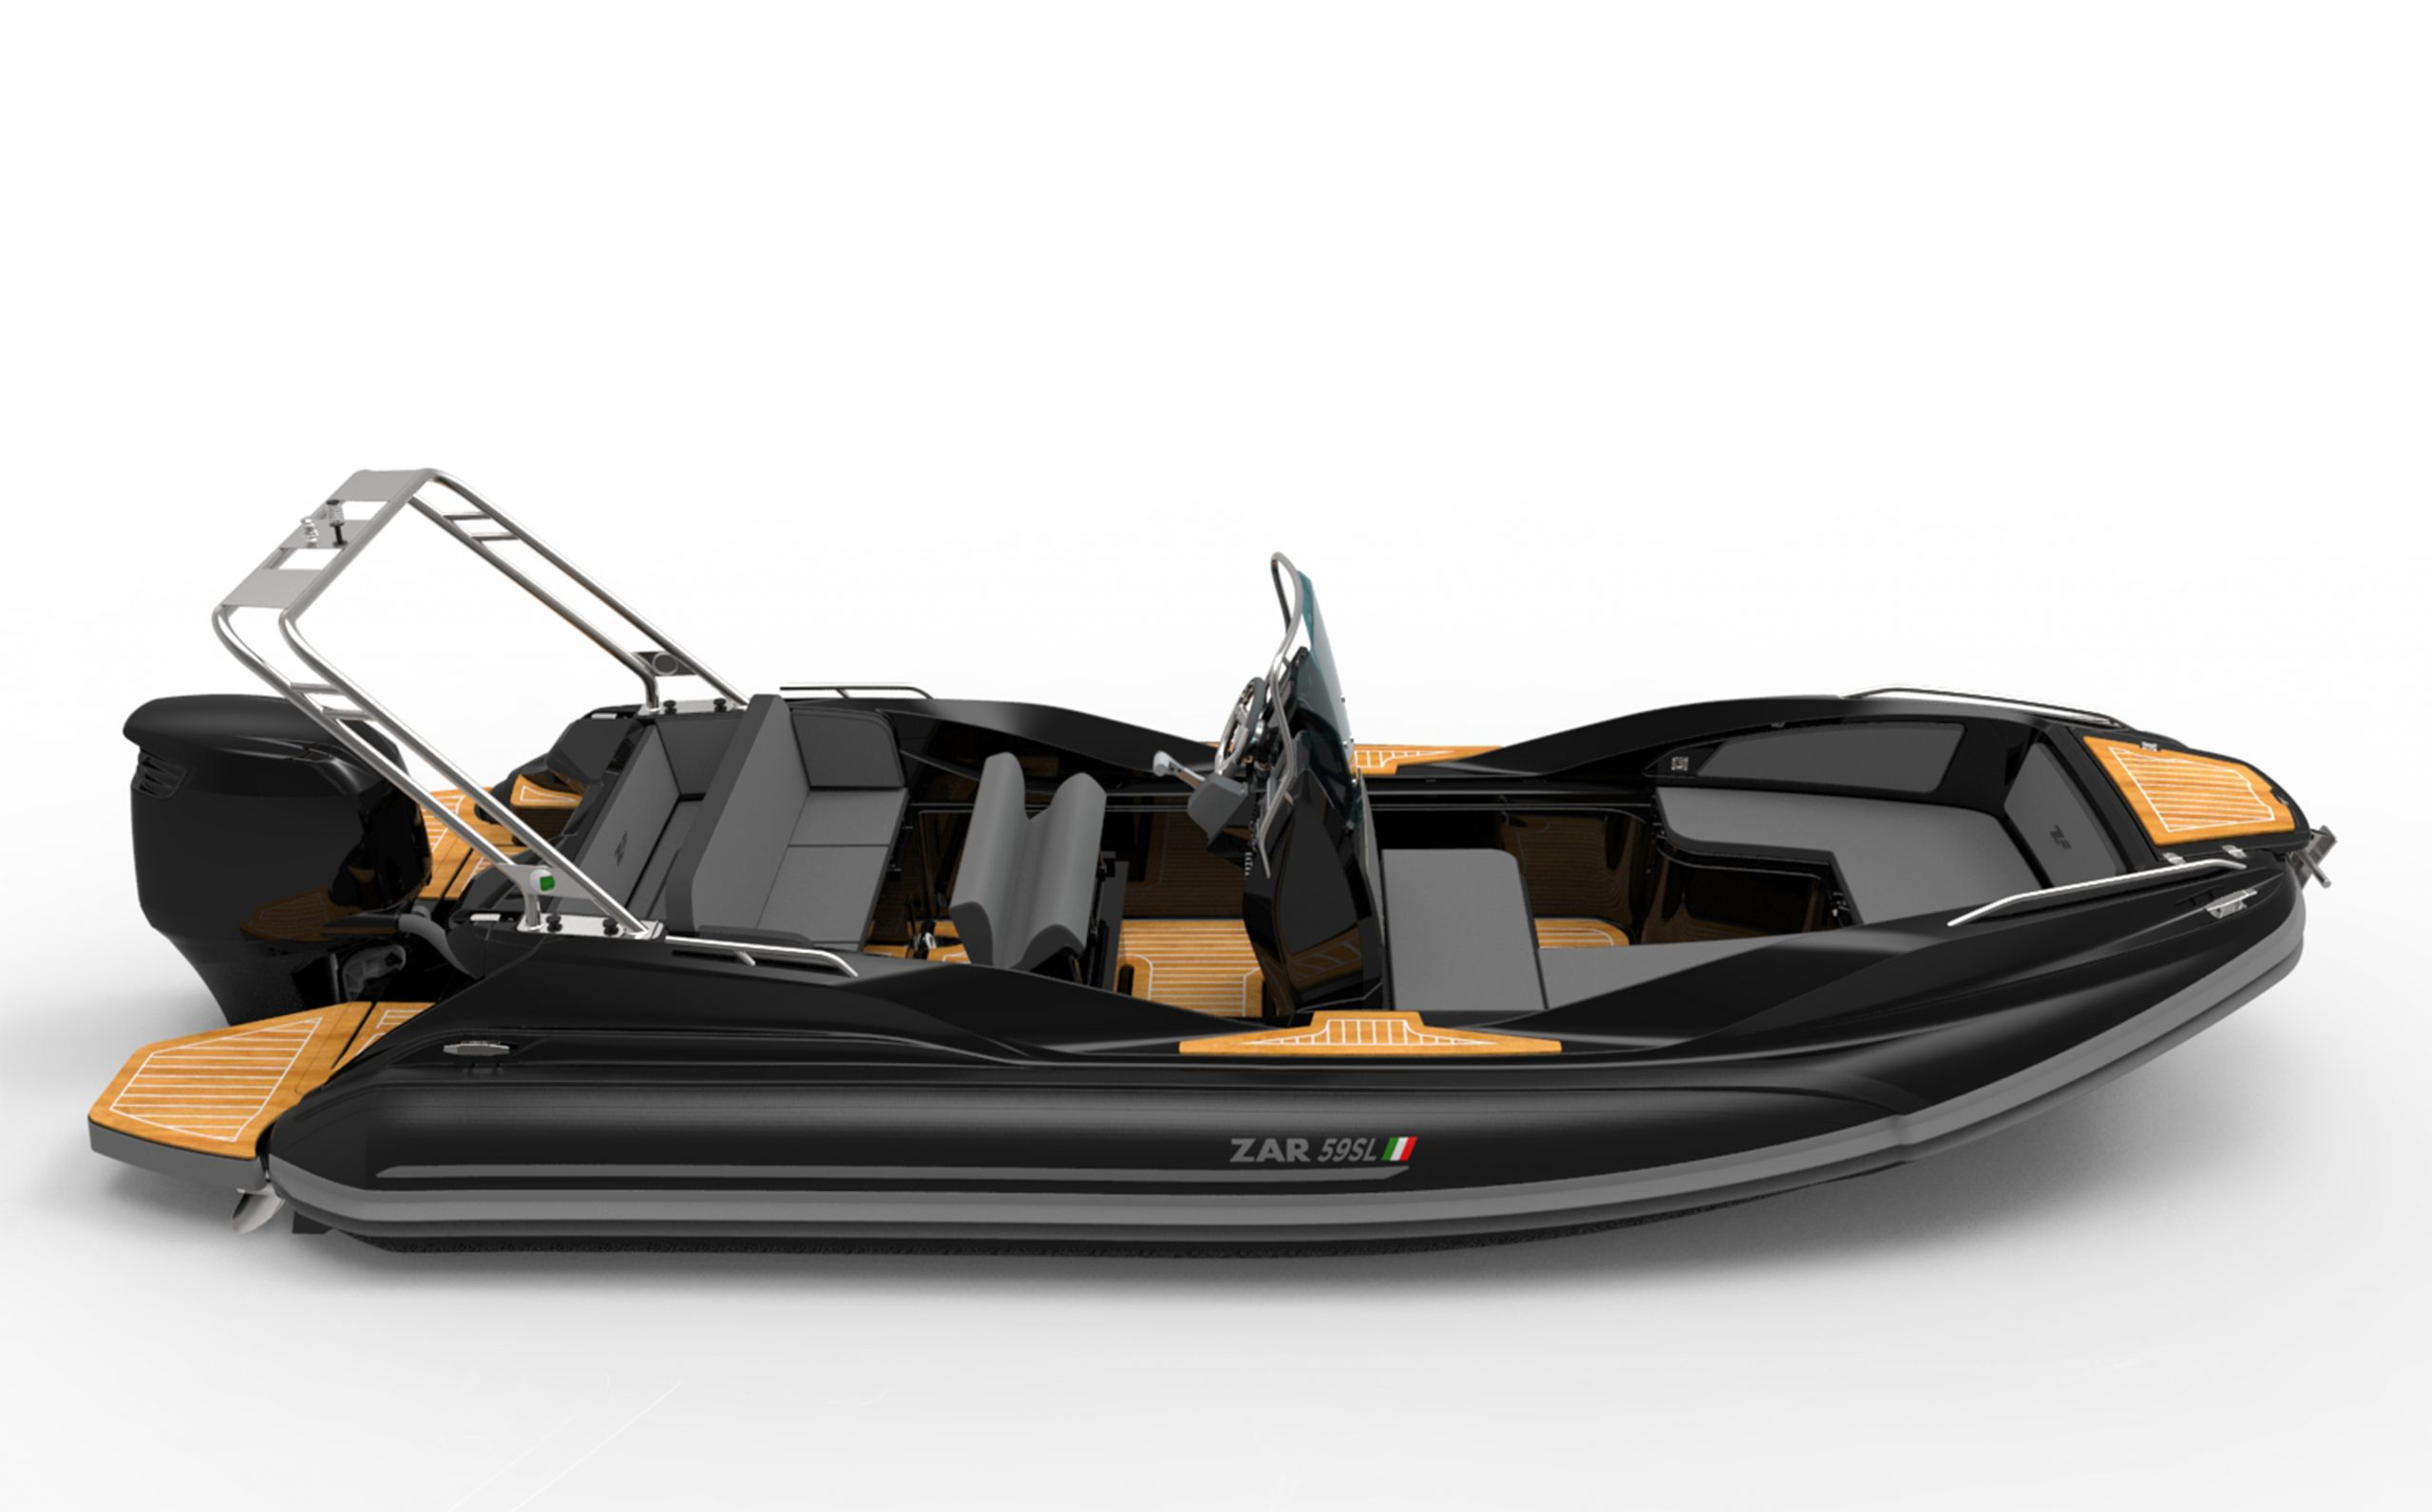 59 sport luxury-74631